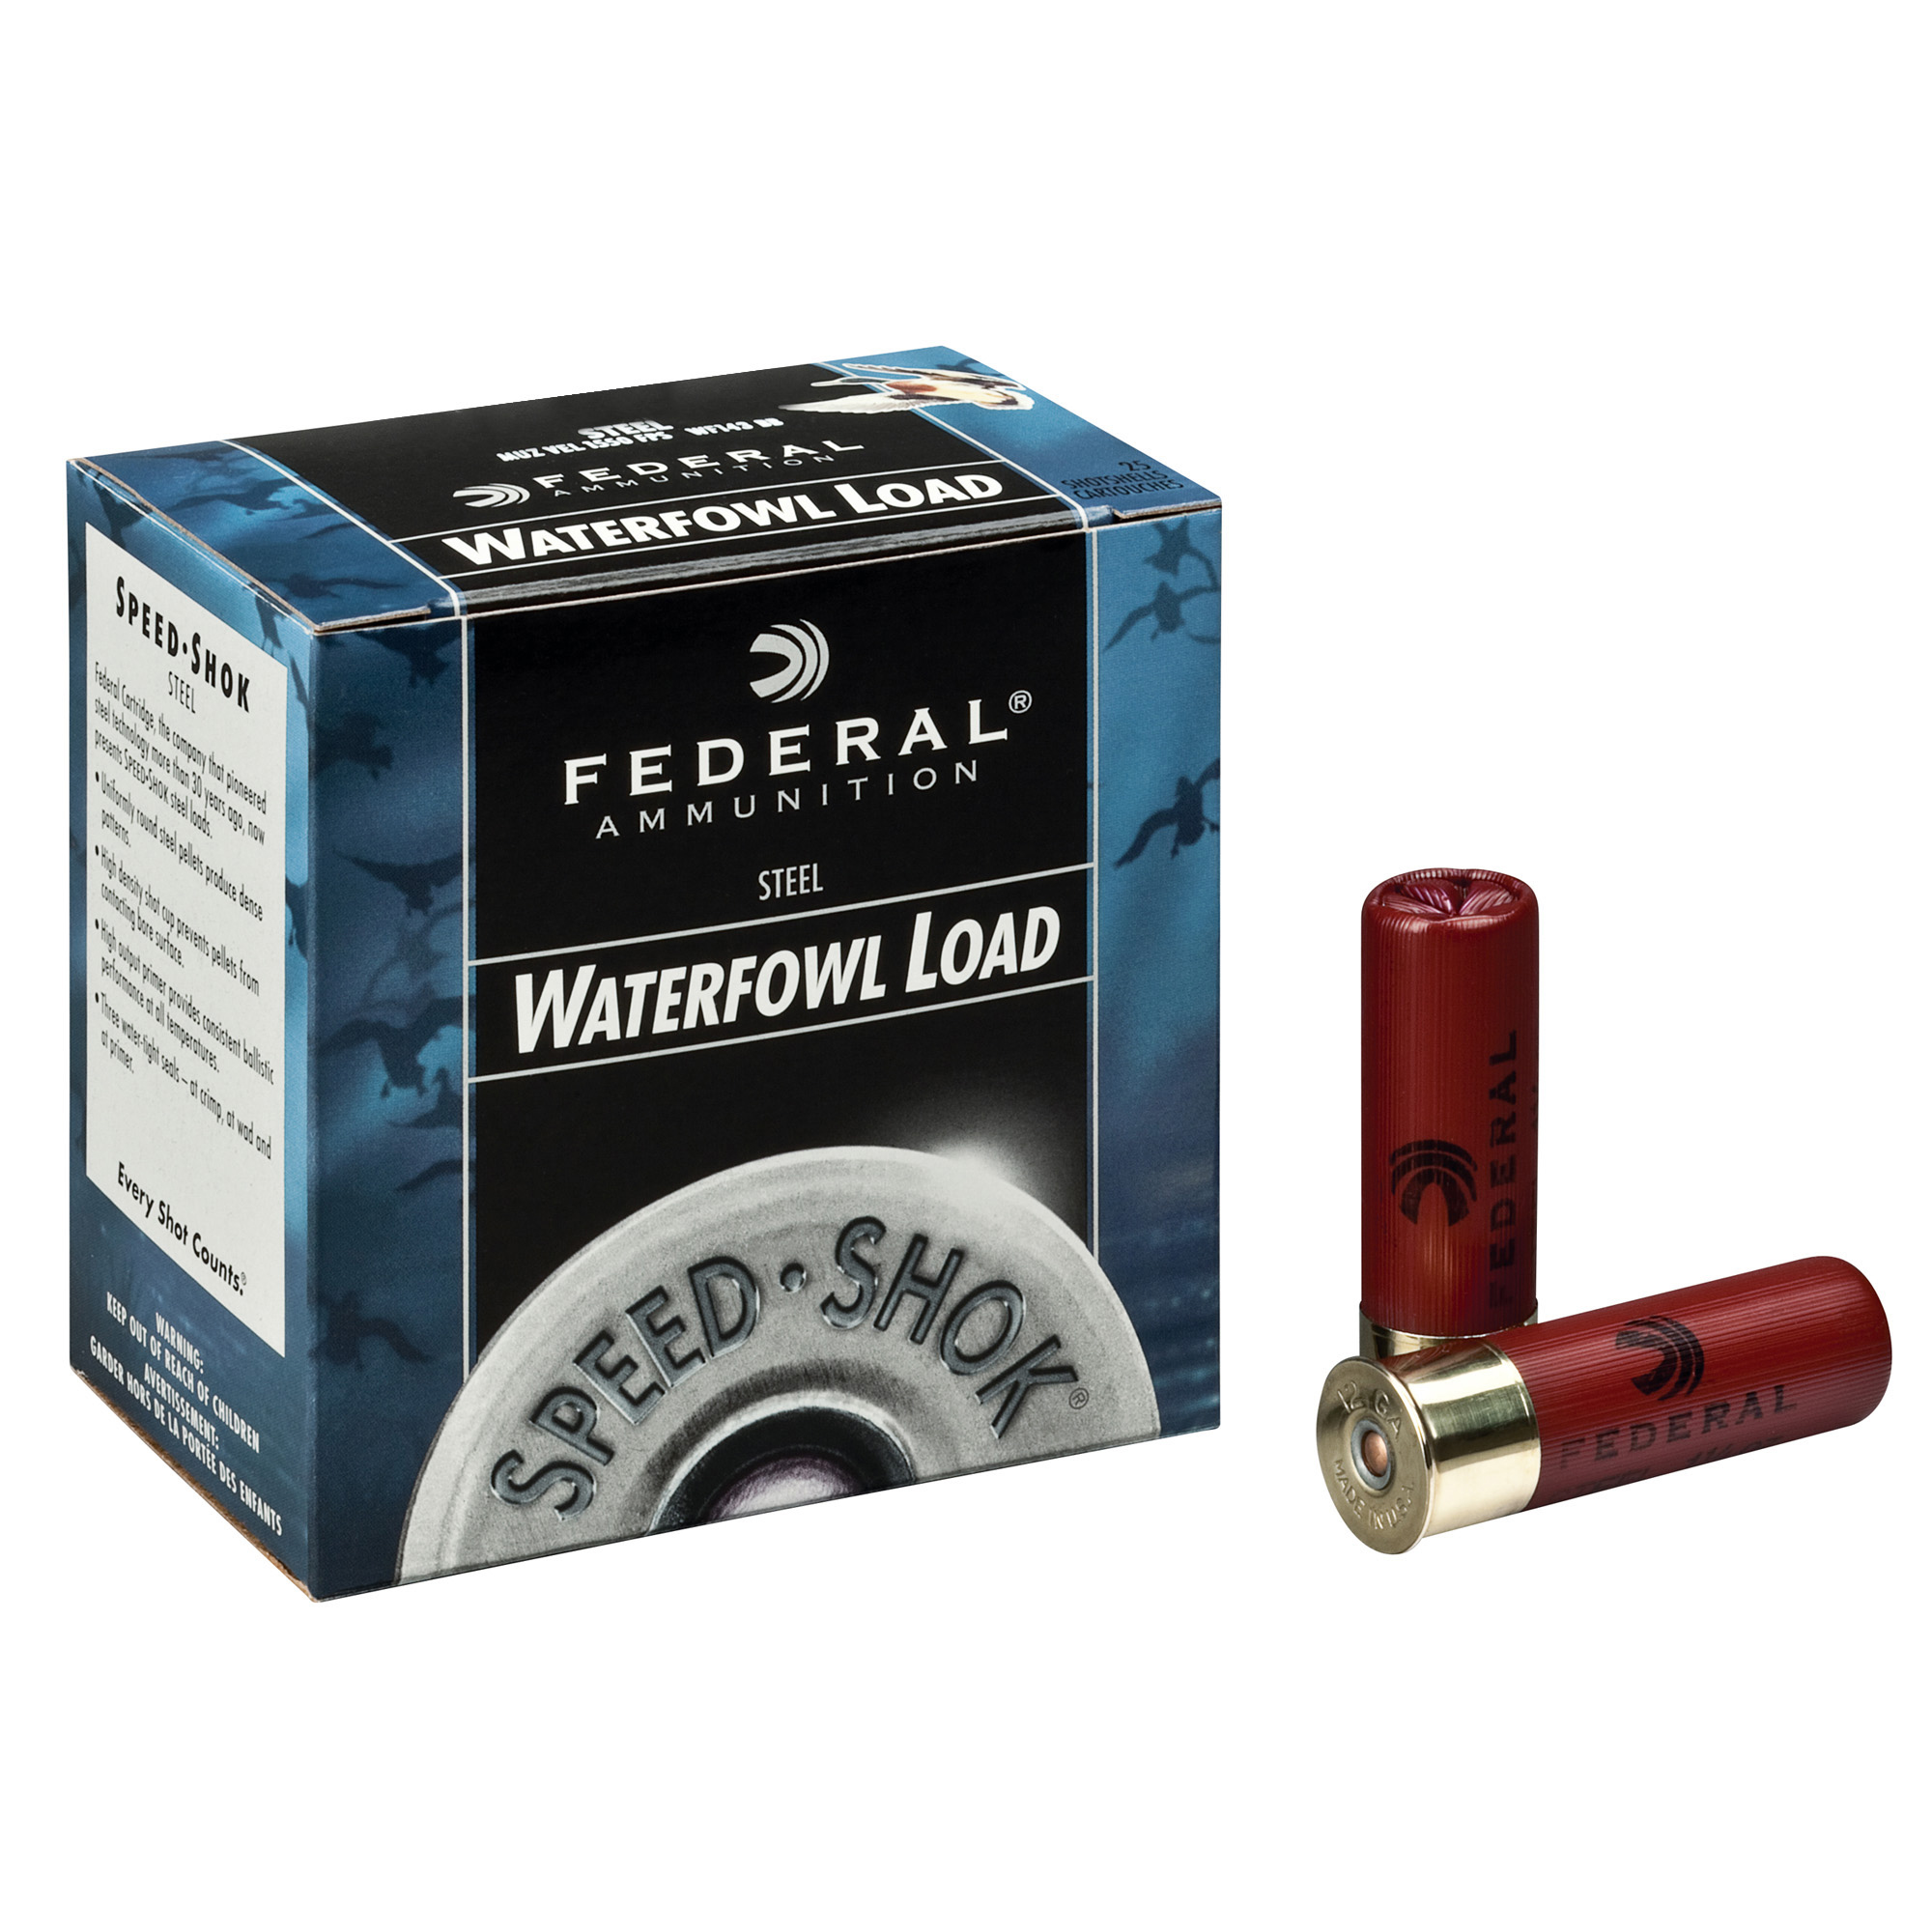 Federal Premium Speed-Shok Waterfowl Ammo, 12 Gauge, 3-1/2″, 1-3/8 oz, #3